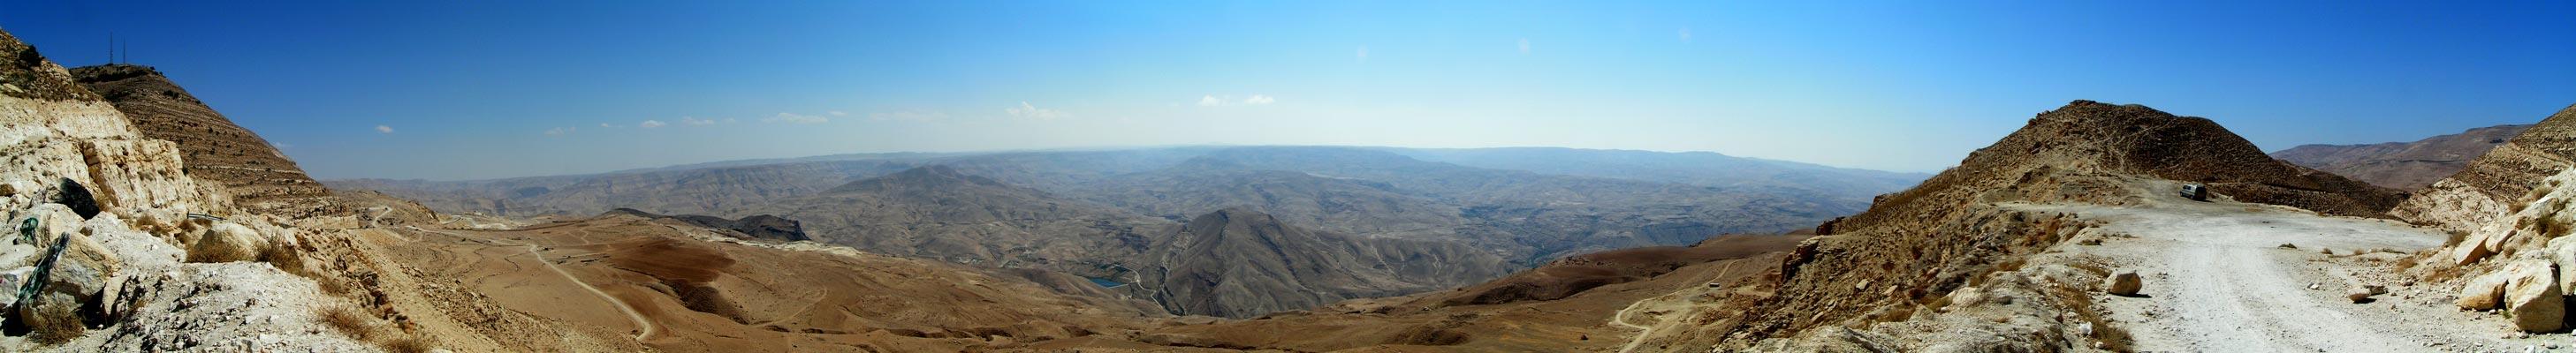 Panoráma Jordánske hory